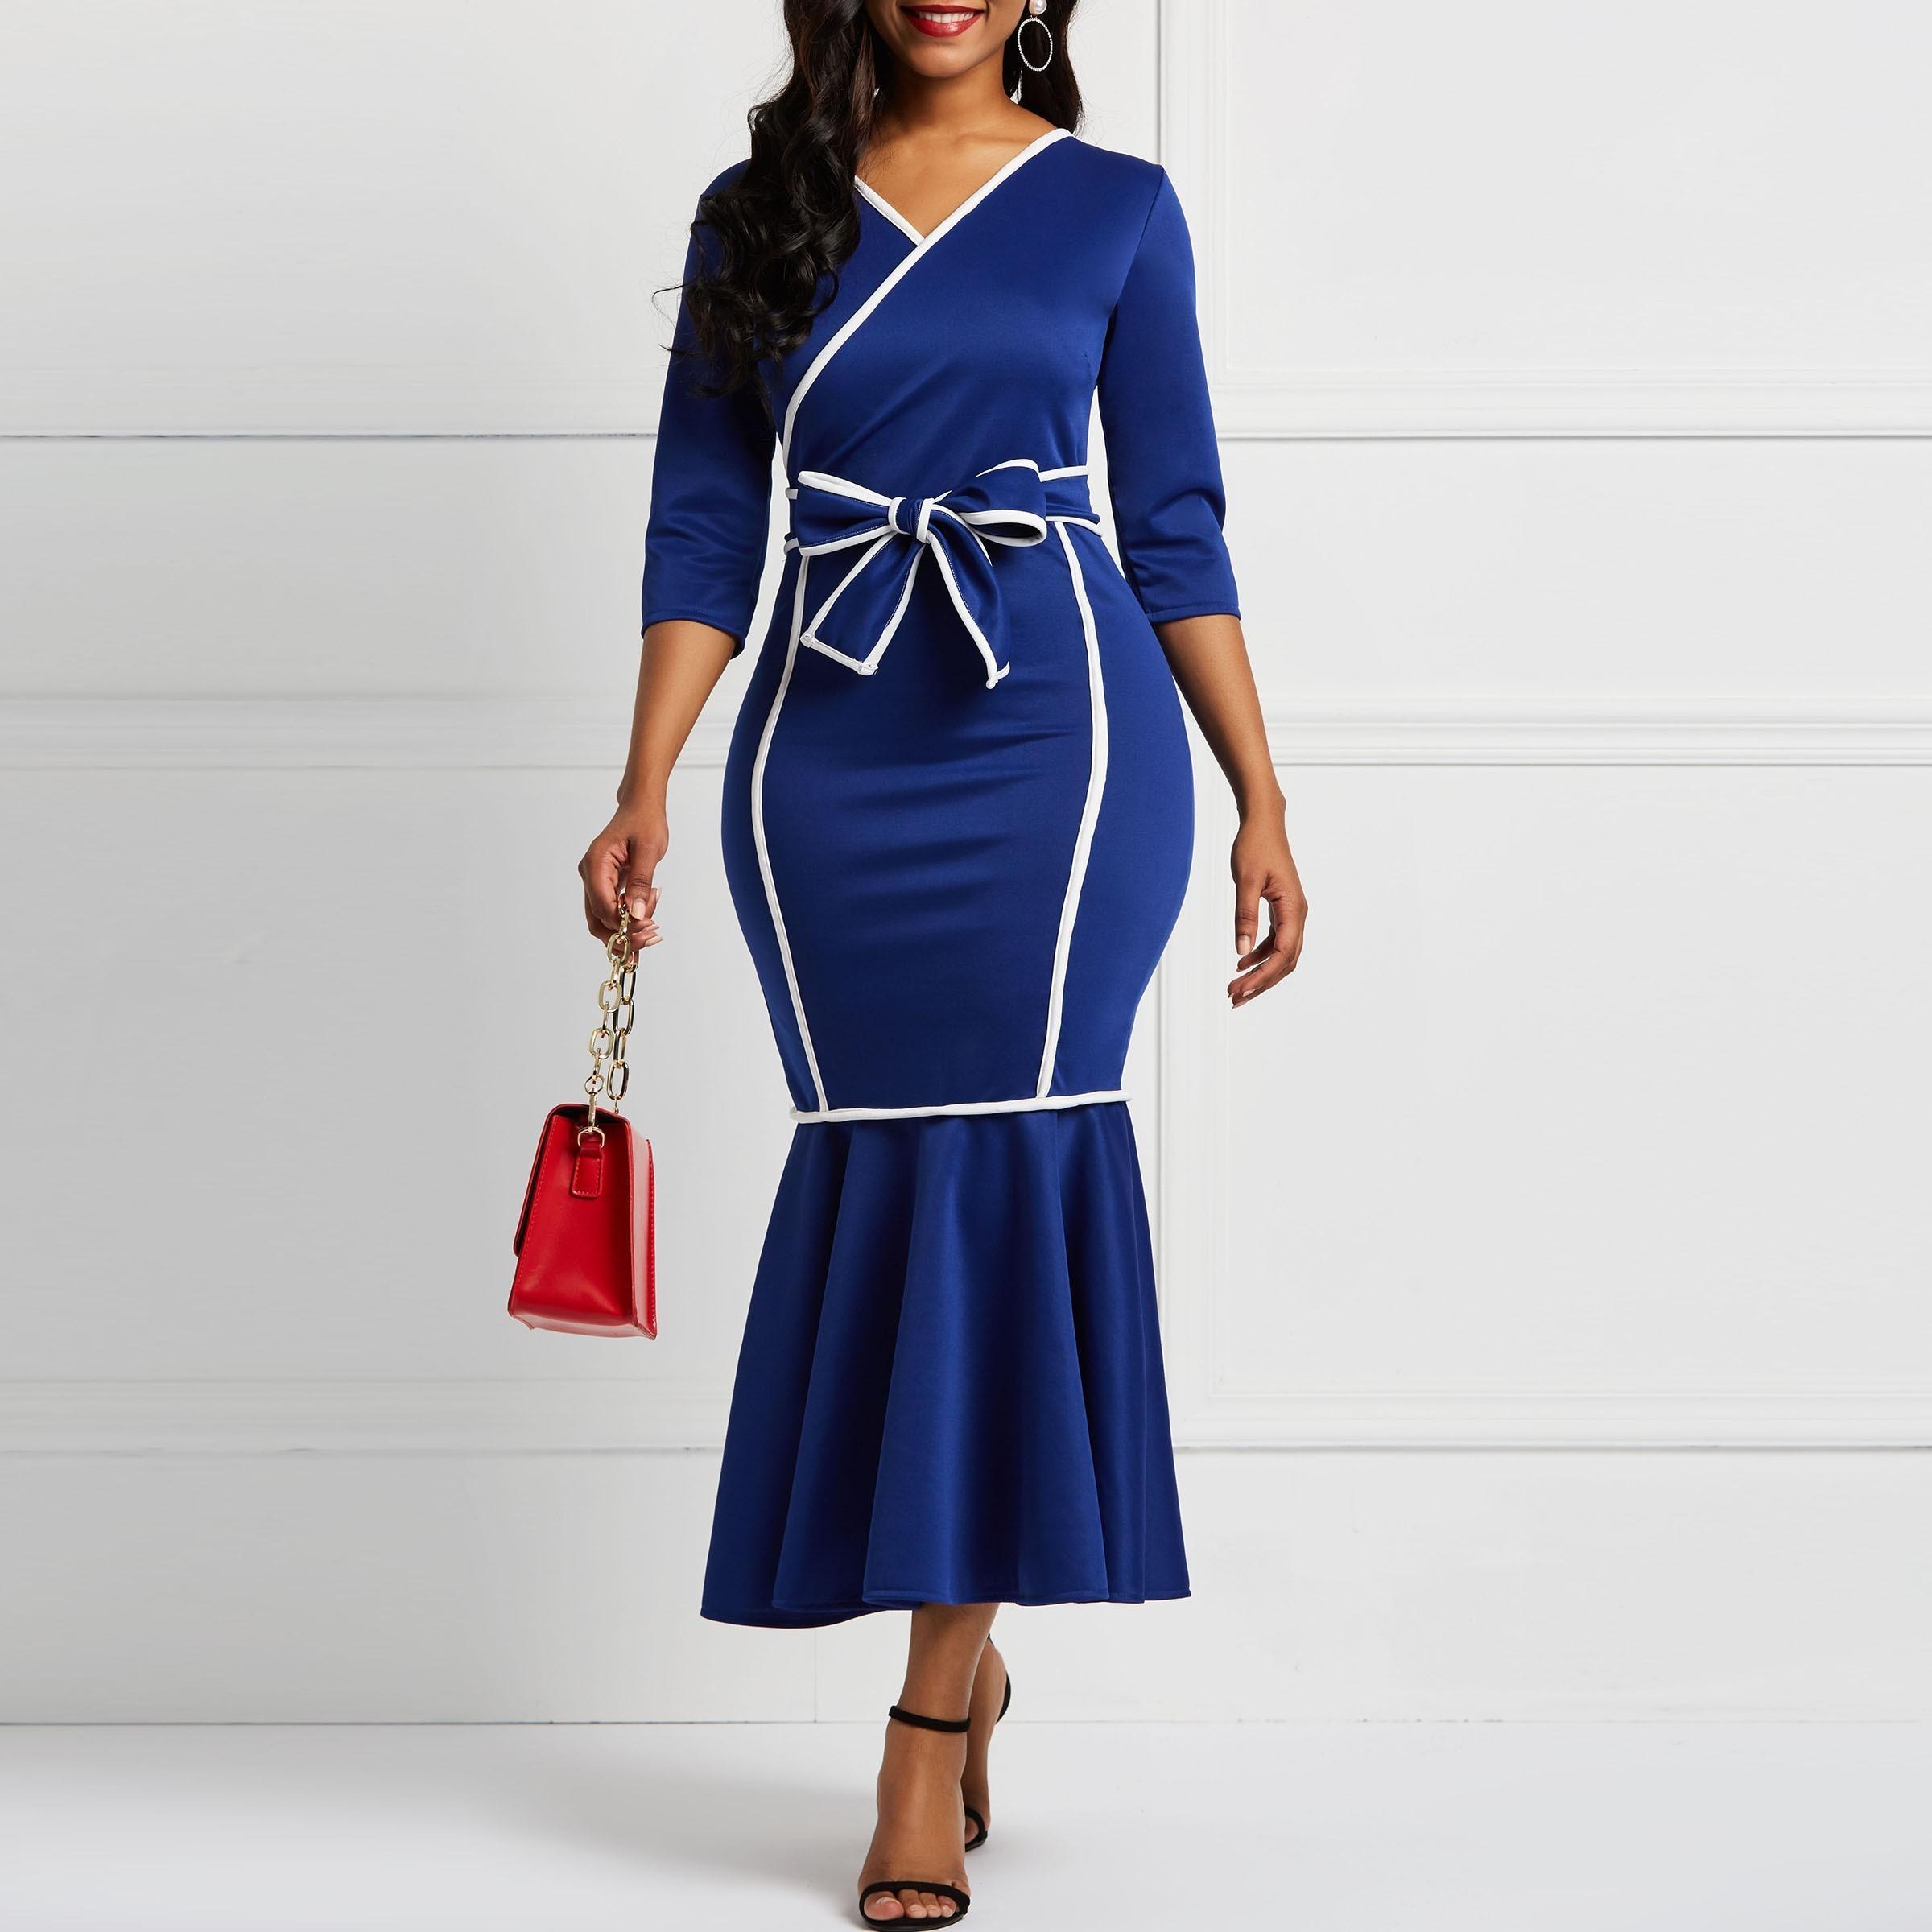 514b064f0f0 Women Dress Long Sleeves Mermaid Falbala V Neck Color Block Women ...